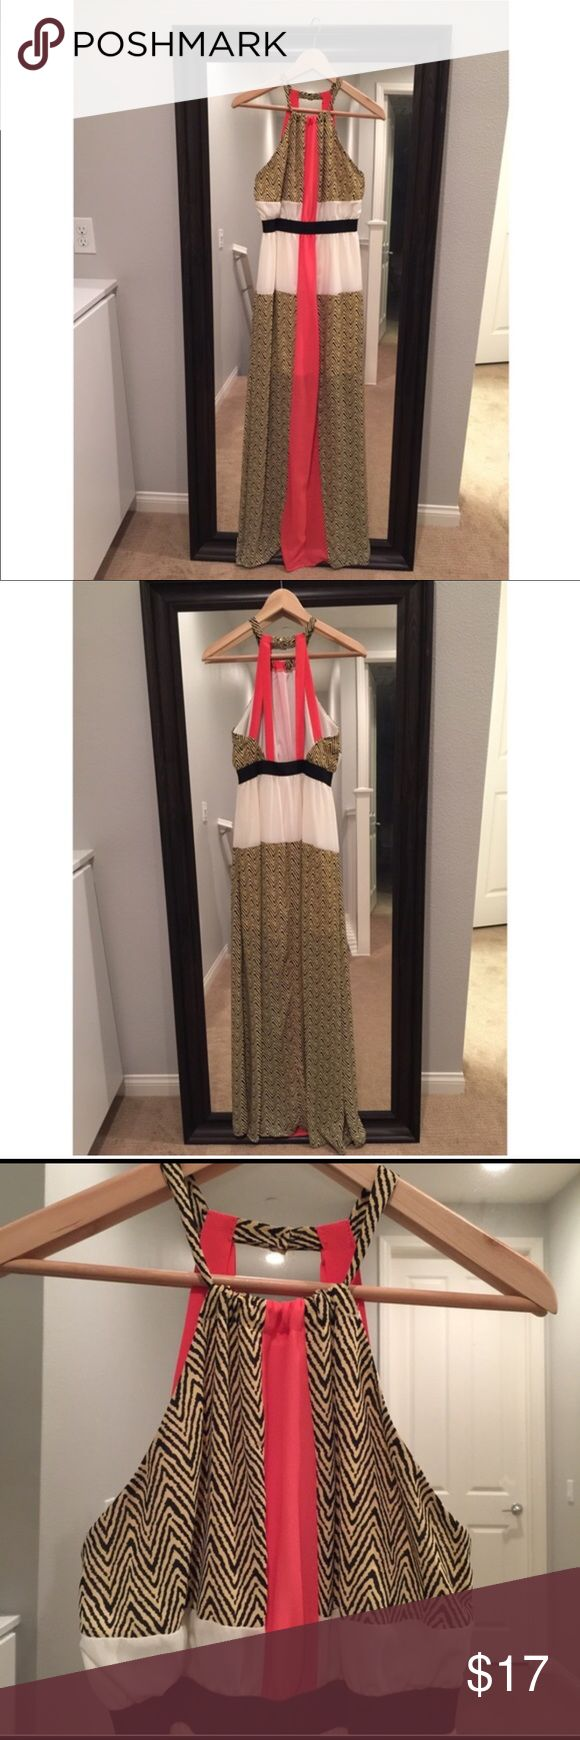 Maxi Dress | Apricot Lane Boutique Maxi Dress | Strappy Back | Purchased from Apricot Lane Boutique | Like New Condition Apricot Lane Dresses Maxi